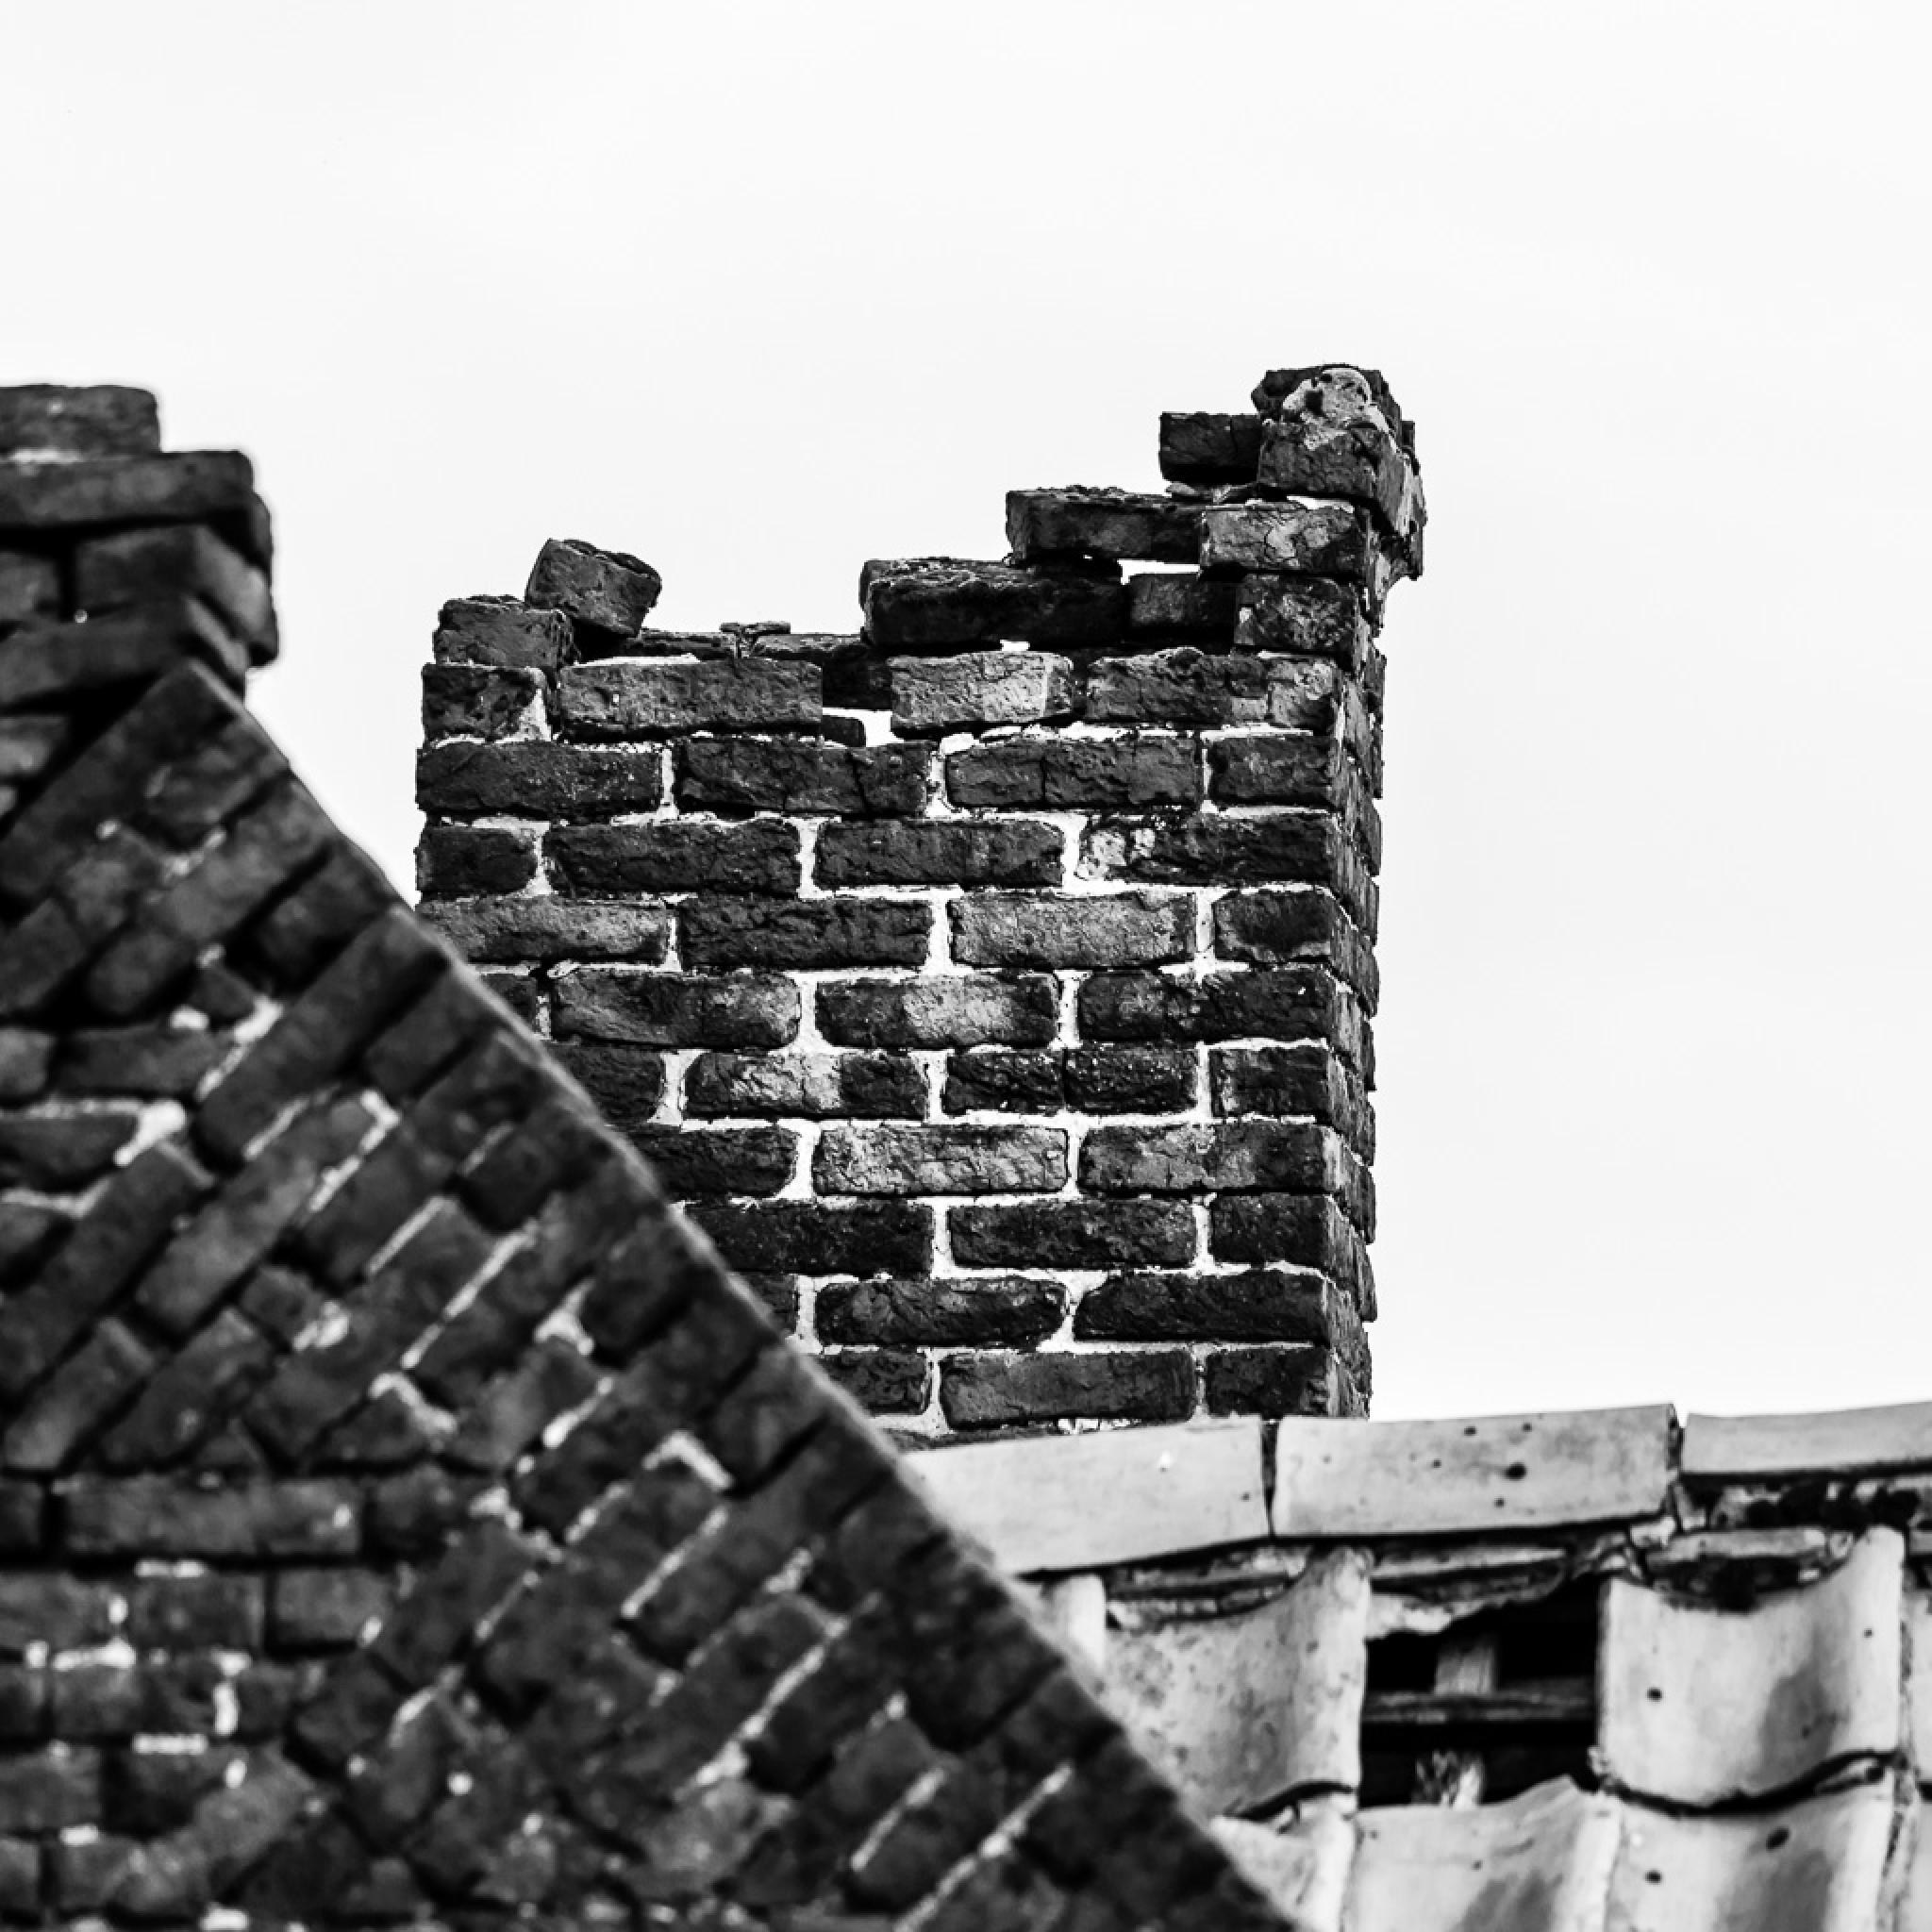 Brick balance by Frédéric Masure